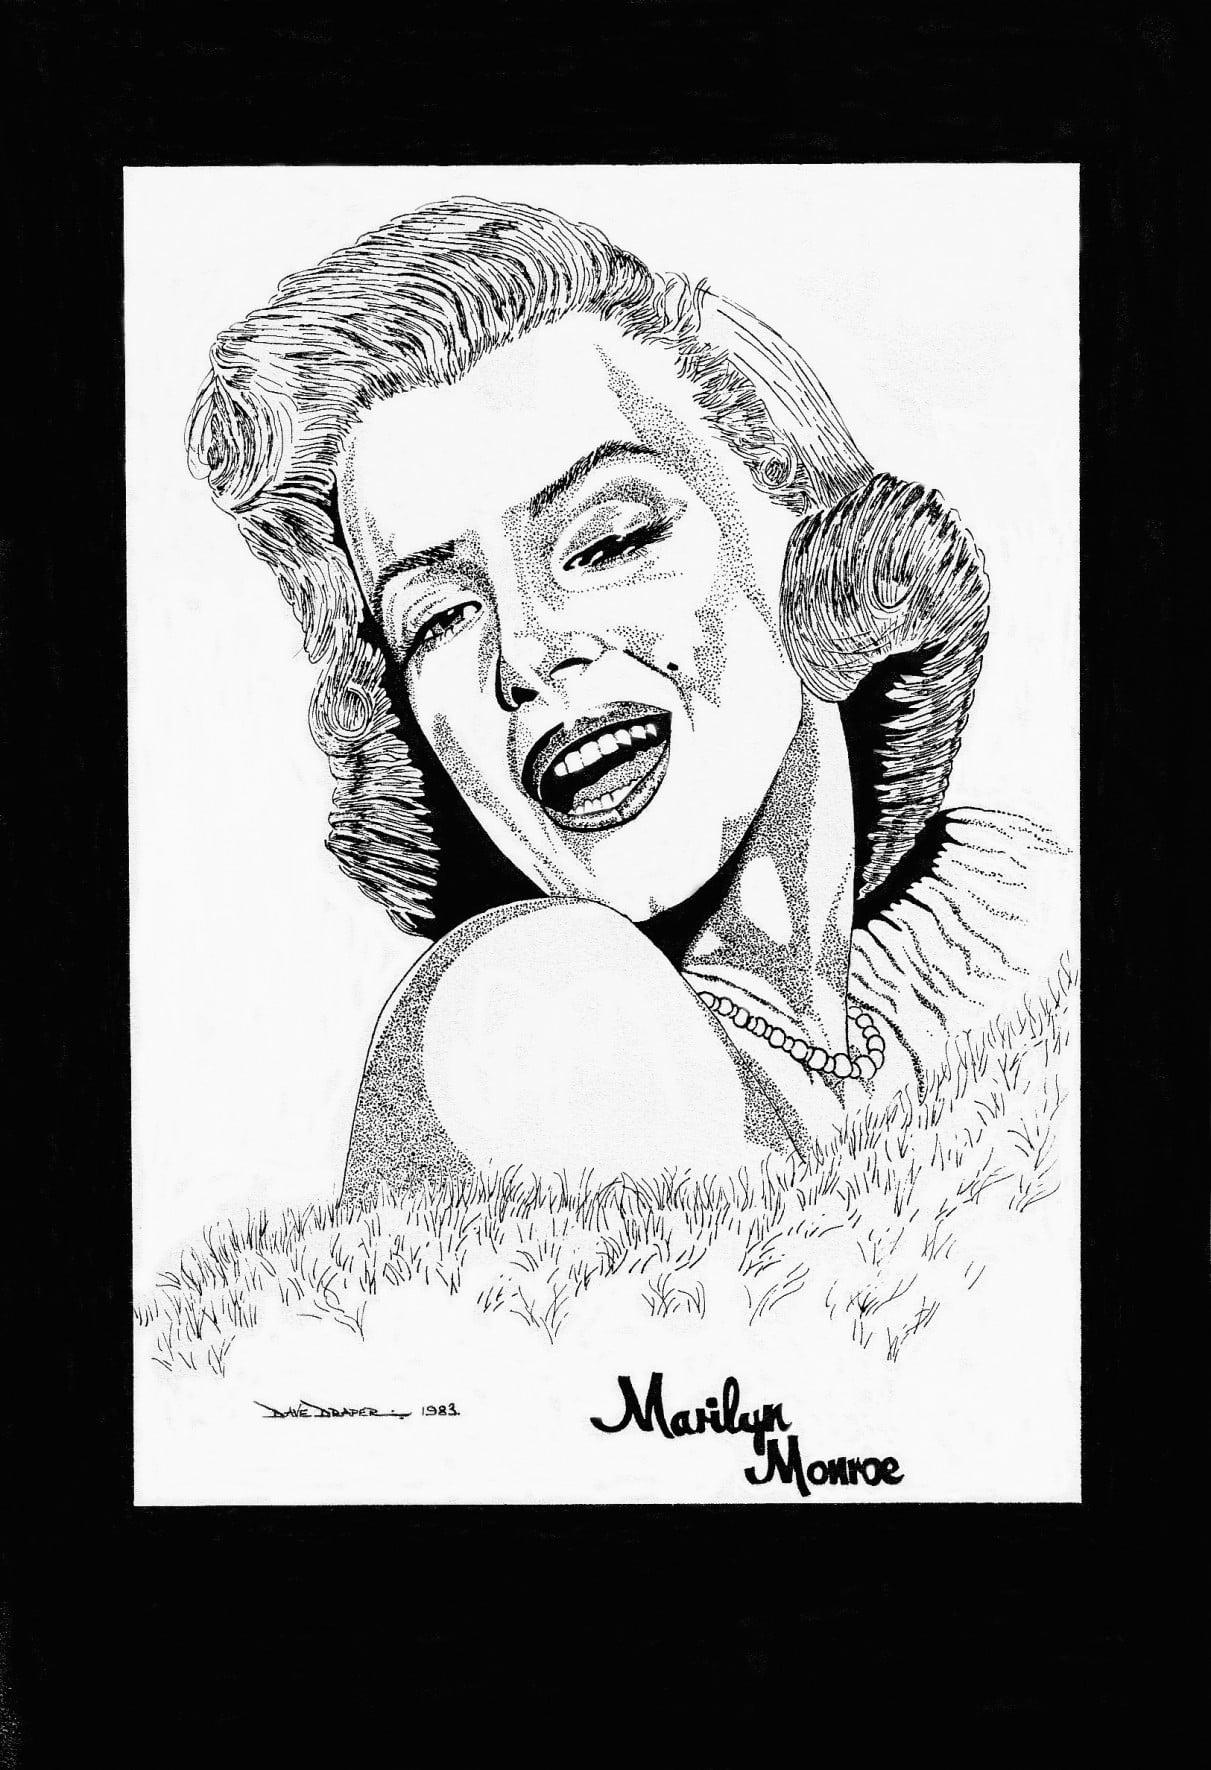 Classic marilyn on display - 4 8